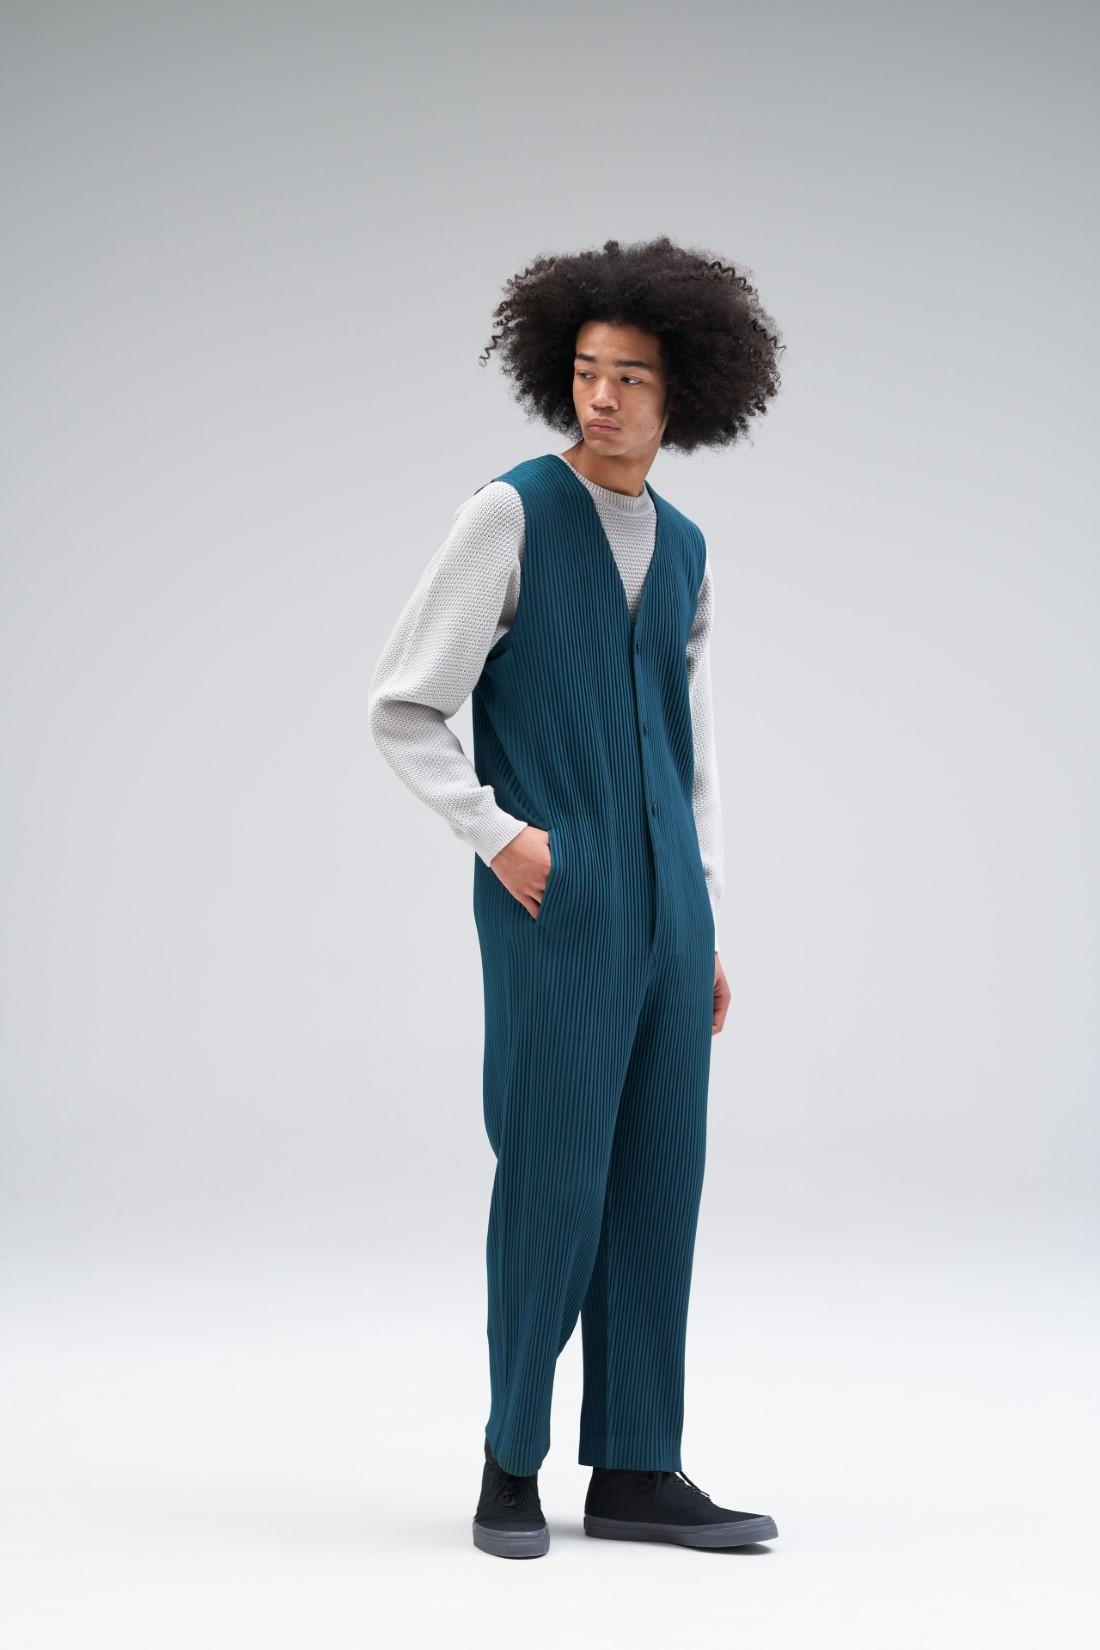 HOMME PLISSÉ ISSEY MIYAKE - Automne-Hiver 2021 - Paris Fashion Week